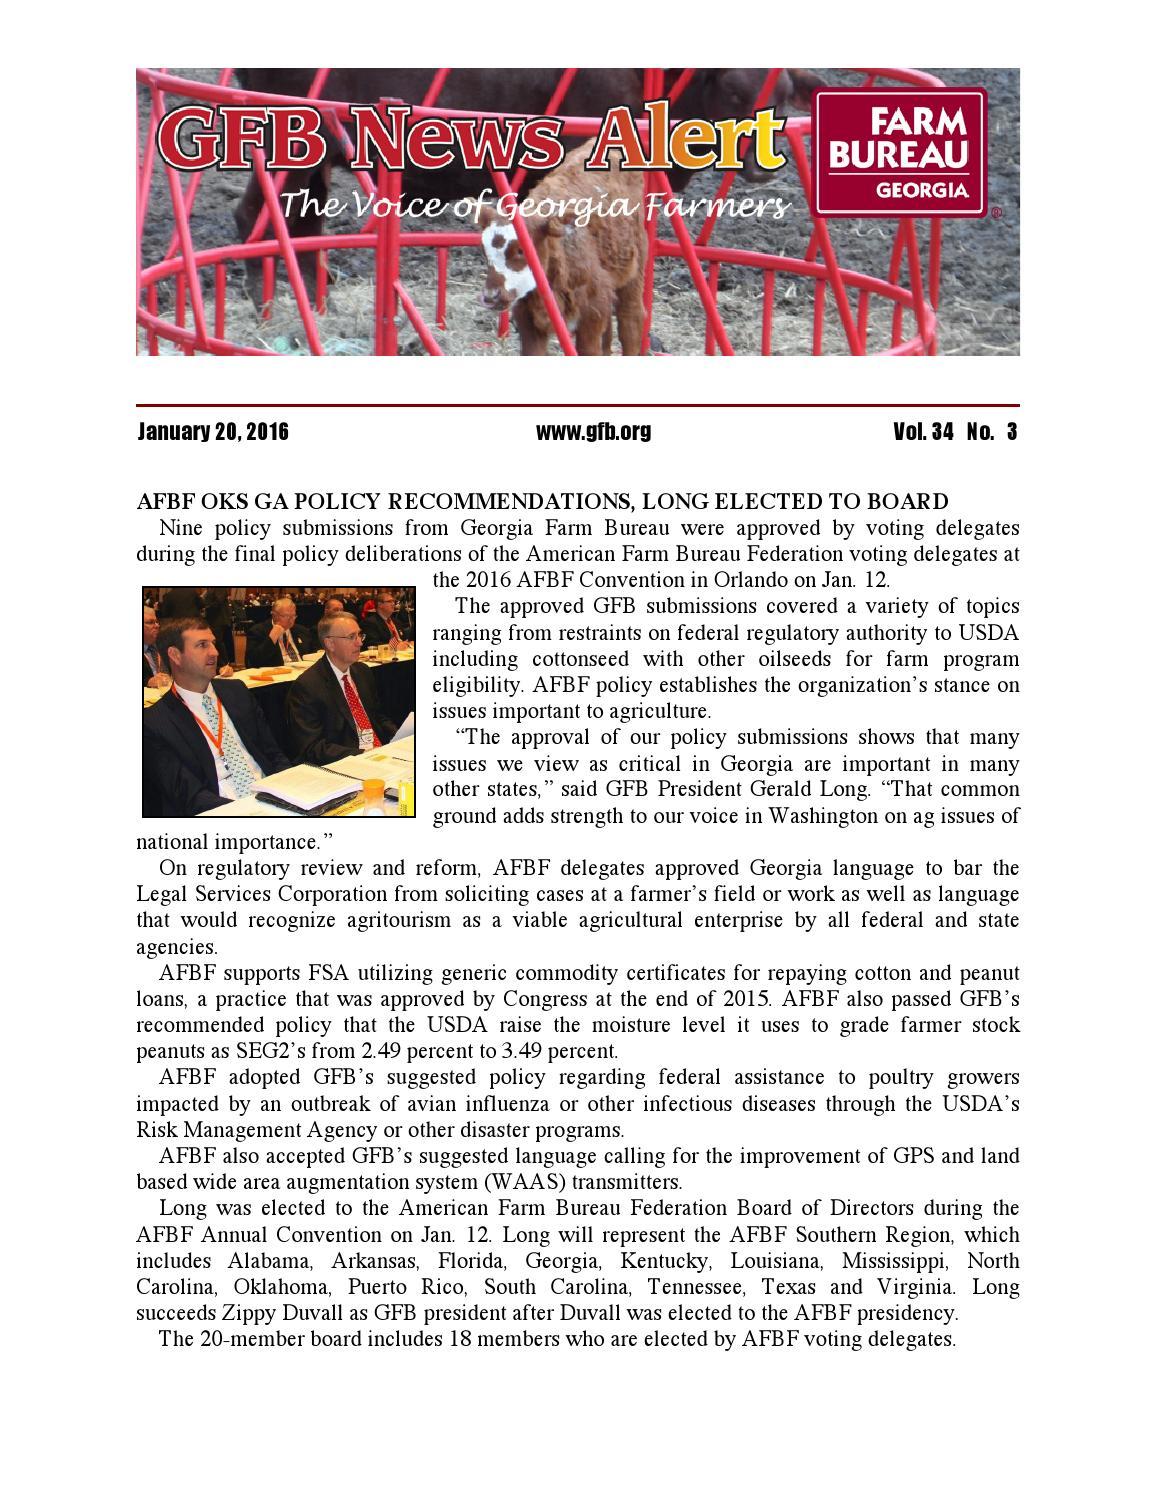 georgia farm bureau news alert january 20 2016 by georgia farm bureau issuu. Black Bedroom Furniture Sets. Home Design Ideas